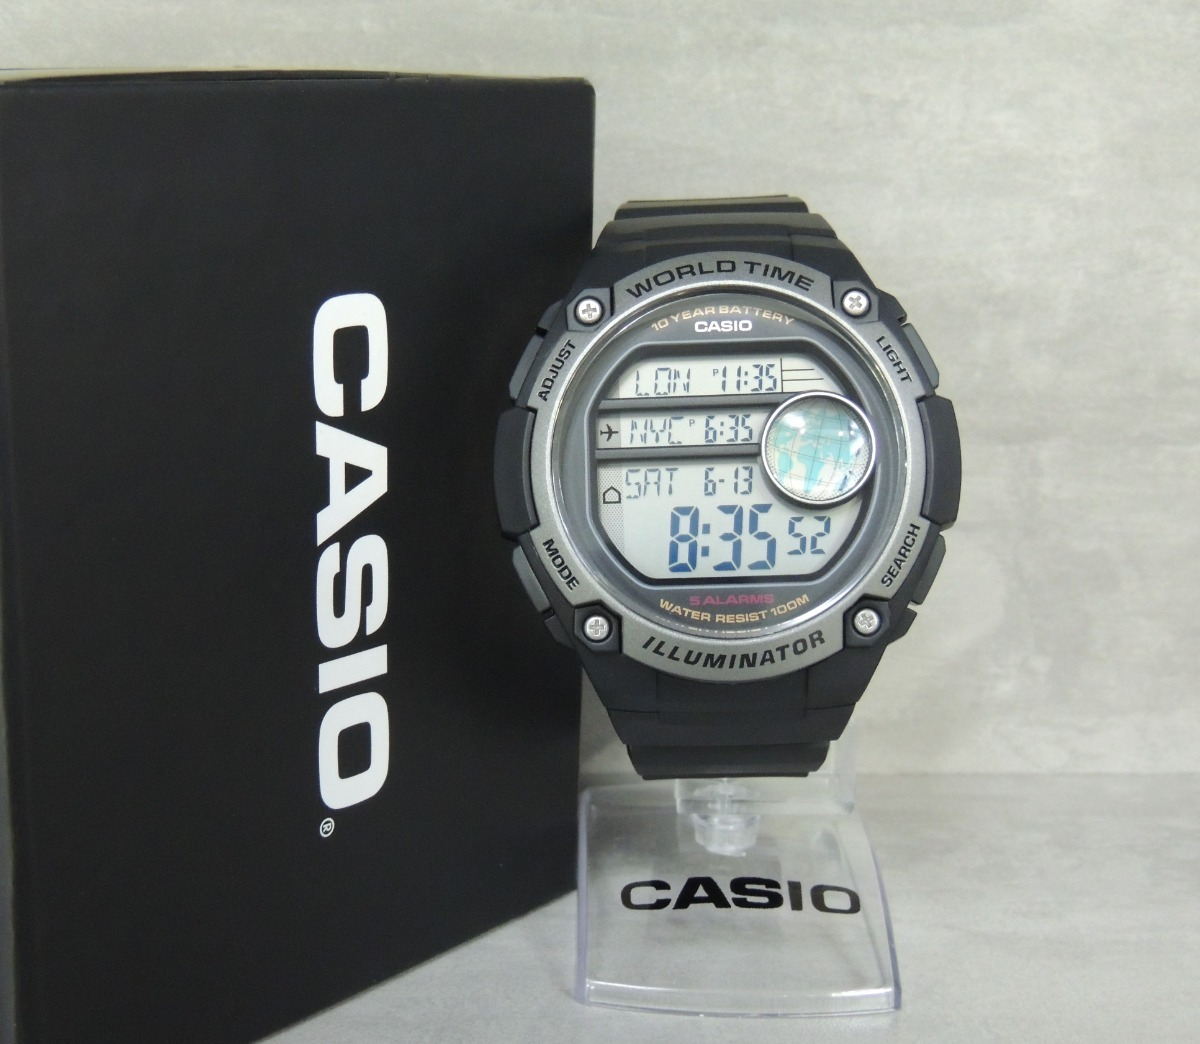 21de6a5ddf9 Relógio Casio Hora Mundial Ae-3000w-1avdf - Nota Fiscal gar - R  308 ...